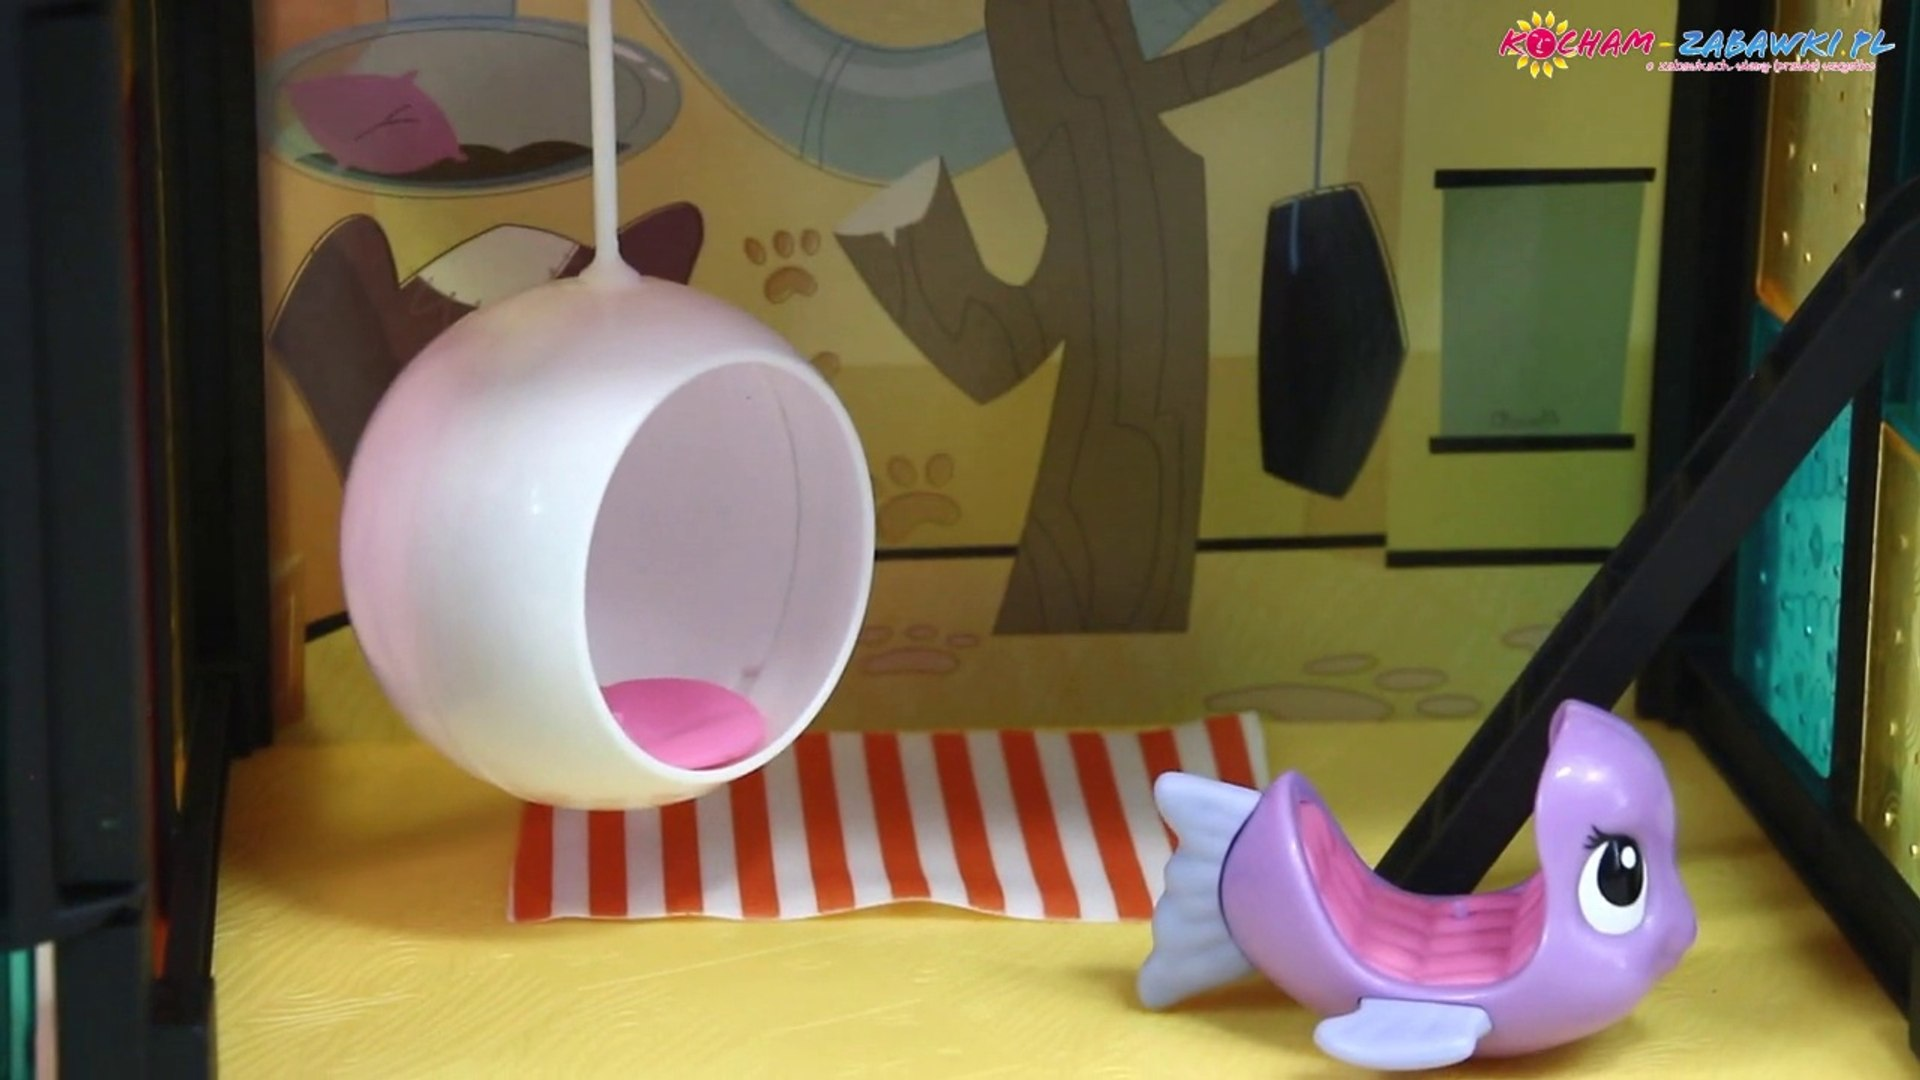 Pet Day Camp Style Set / Zestaw Dzień Zabawy - Littlest Pet Shop - A9478 - Recenzja